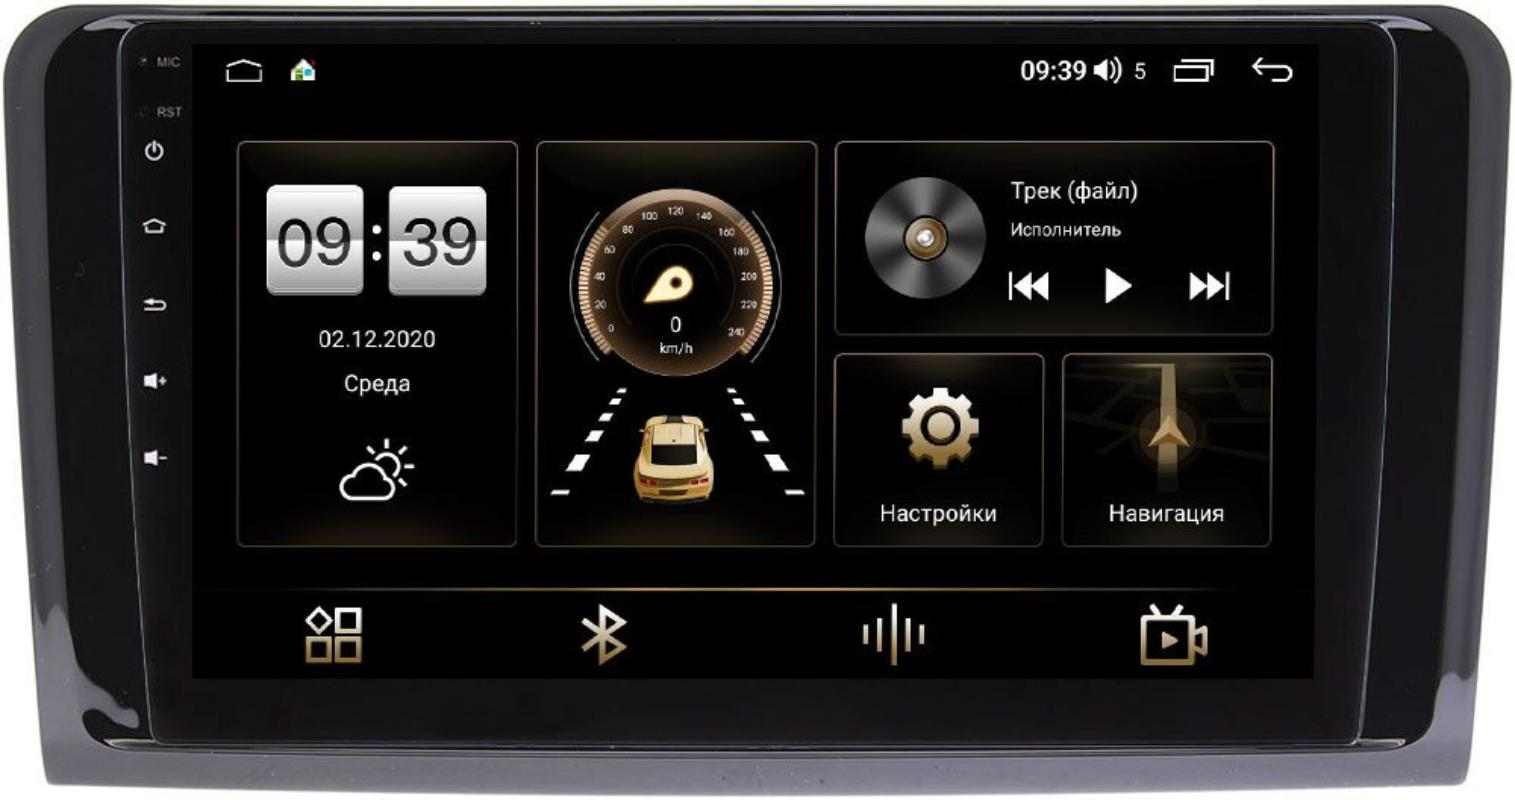 Штатная магнитола Mercedes GL-klasse (X164) 2006-2012, ML-klasse (W164) 2005-2011 (глянец) LeTrun 4166-9249 на Android 10 (4G-SIM, 3/32, DSP, QLed) (+ Камера заднего вида в подарок!)